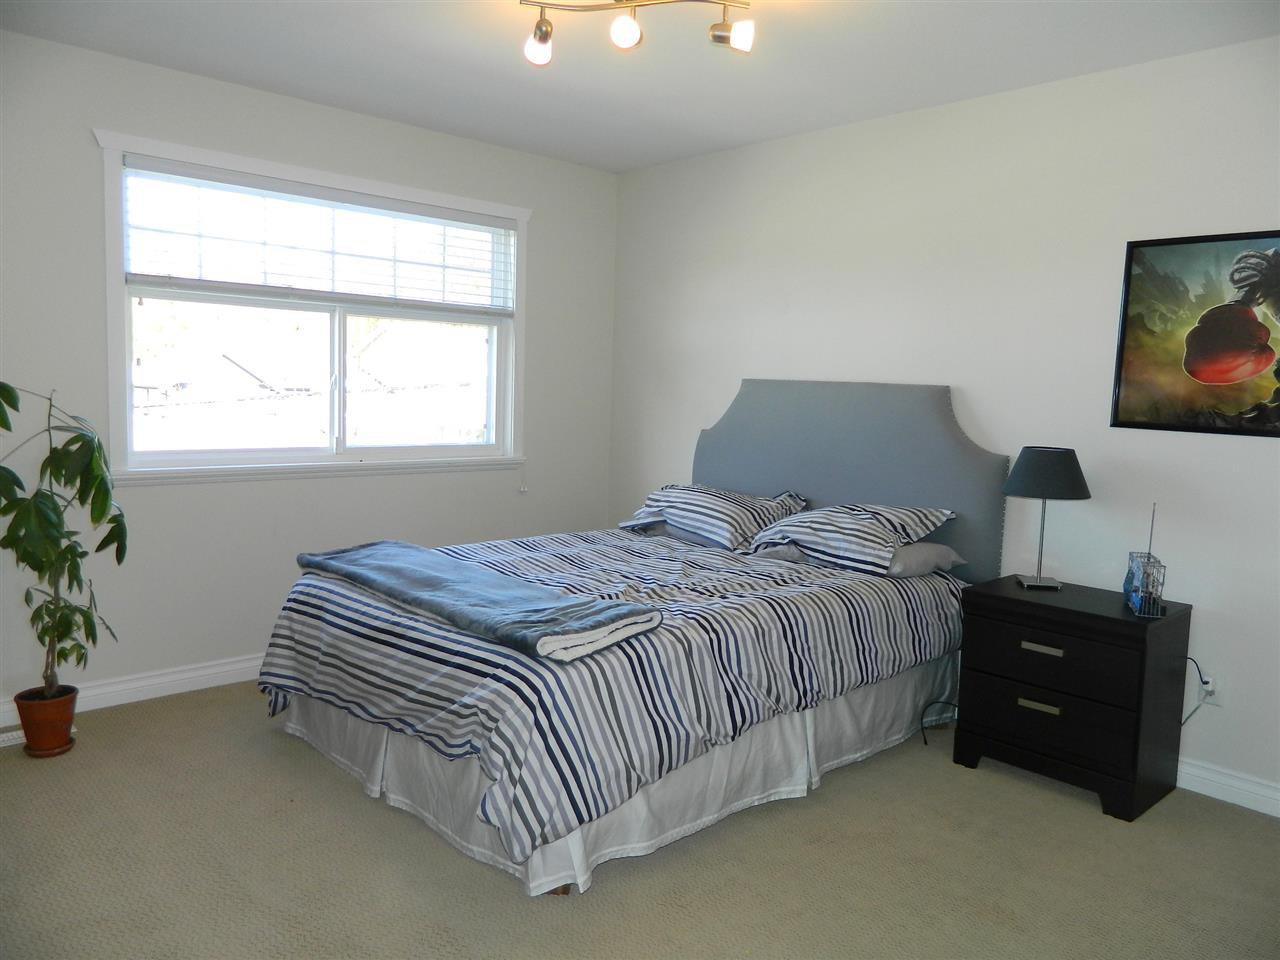 Photo 13: Photos: 24332 104 AVENUE in Maple Ridge: Albion House for sale : MLS®# R2051414